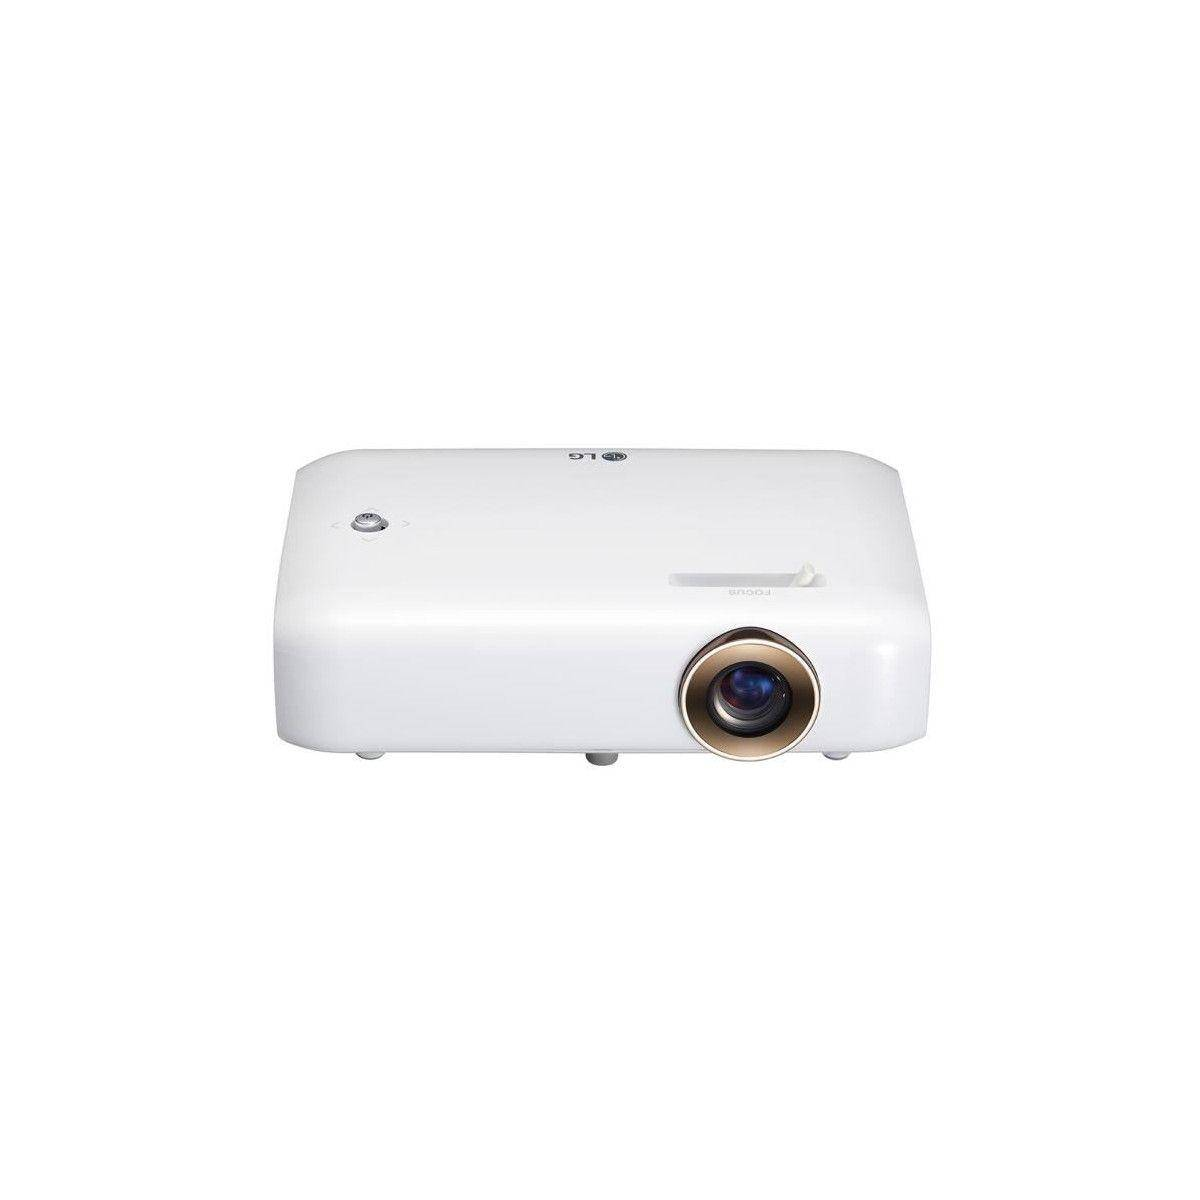 LG PH550G Videoprojecteur LED HD 550 Lumens / 720 p / Contraste 100 000:1 / Bluetooth / HDMI / USB